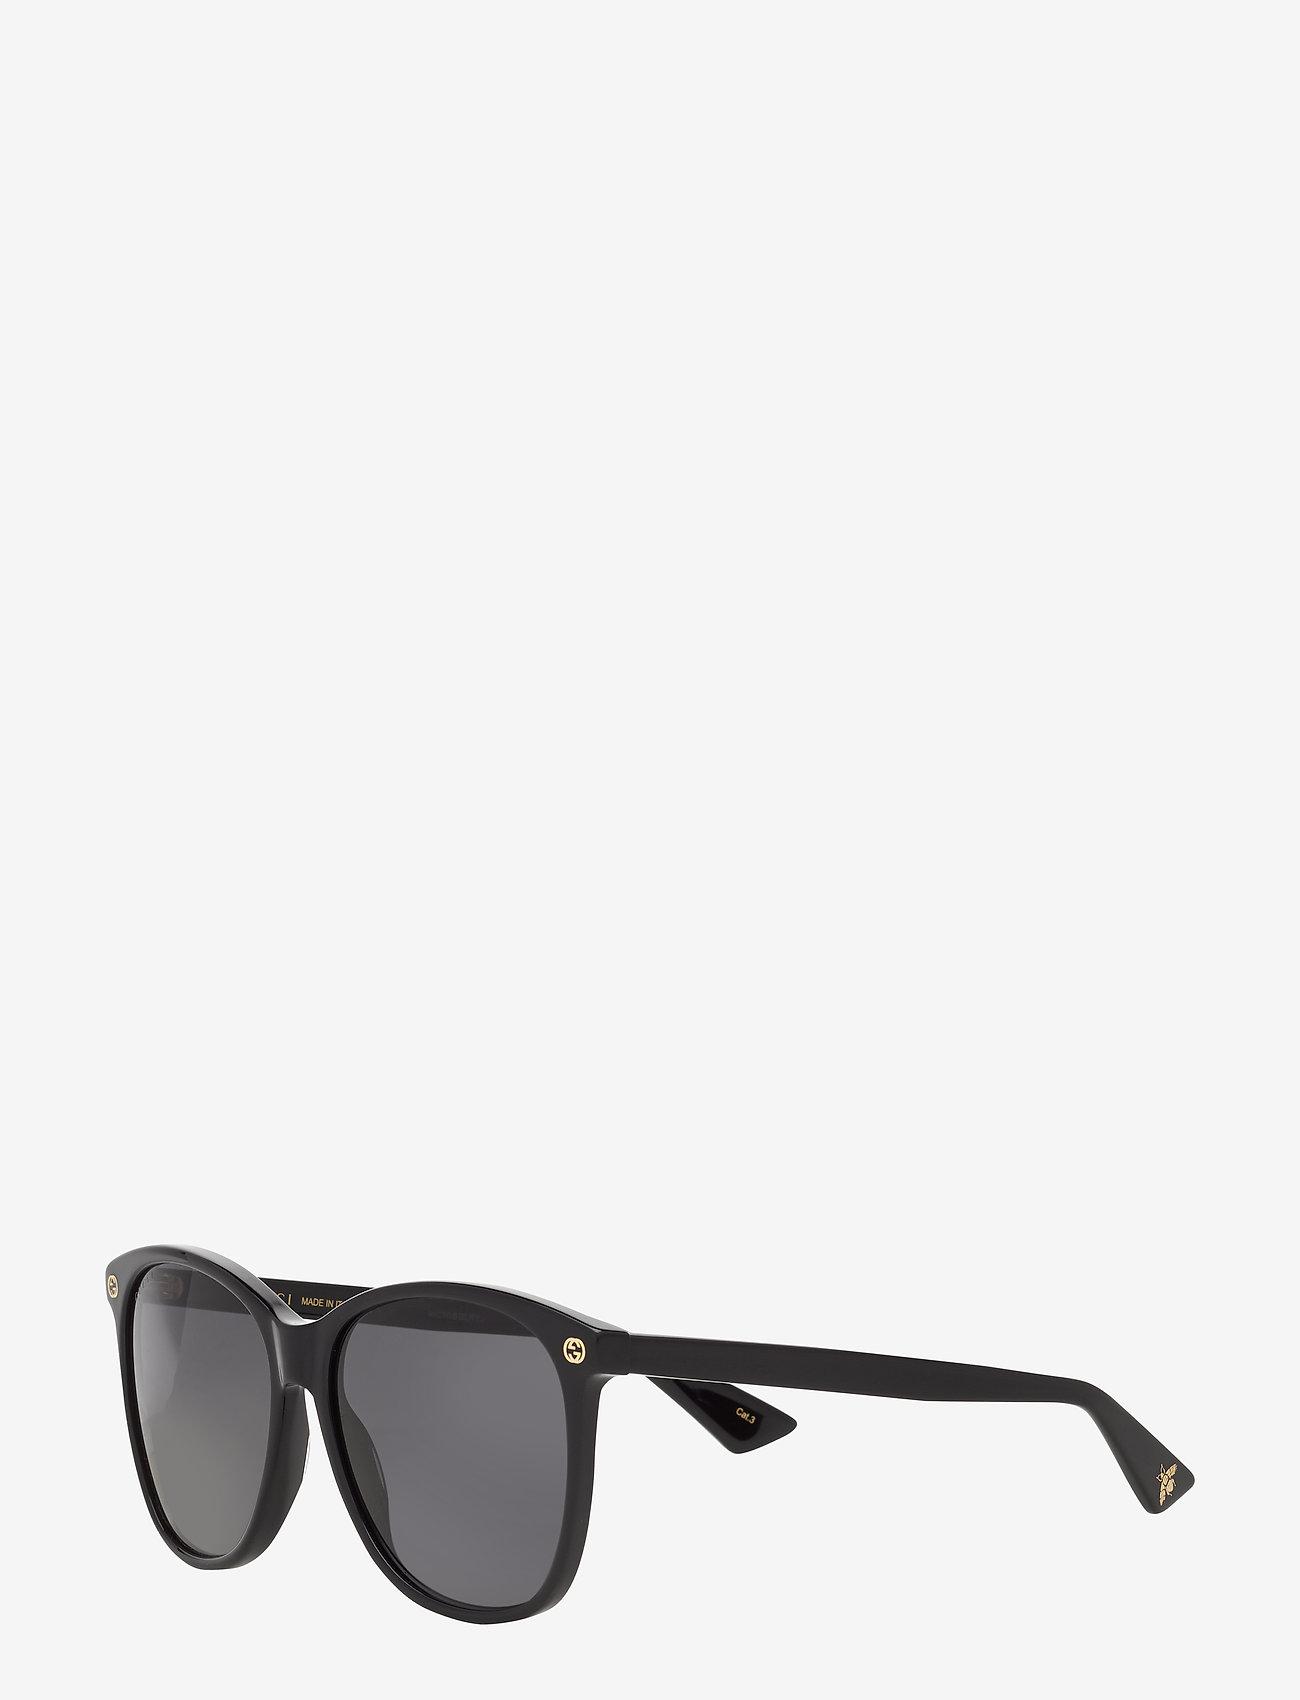 Gucci Sunglasses - GG0024S - d-shaped - black-black-grey - 1